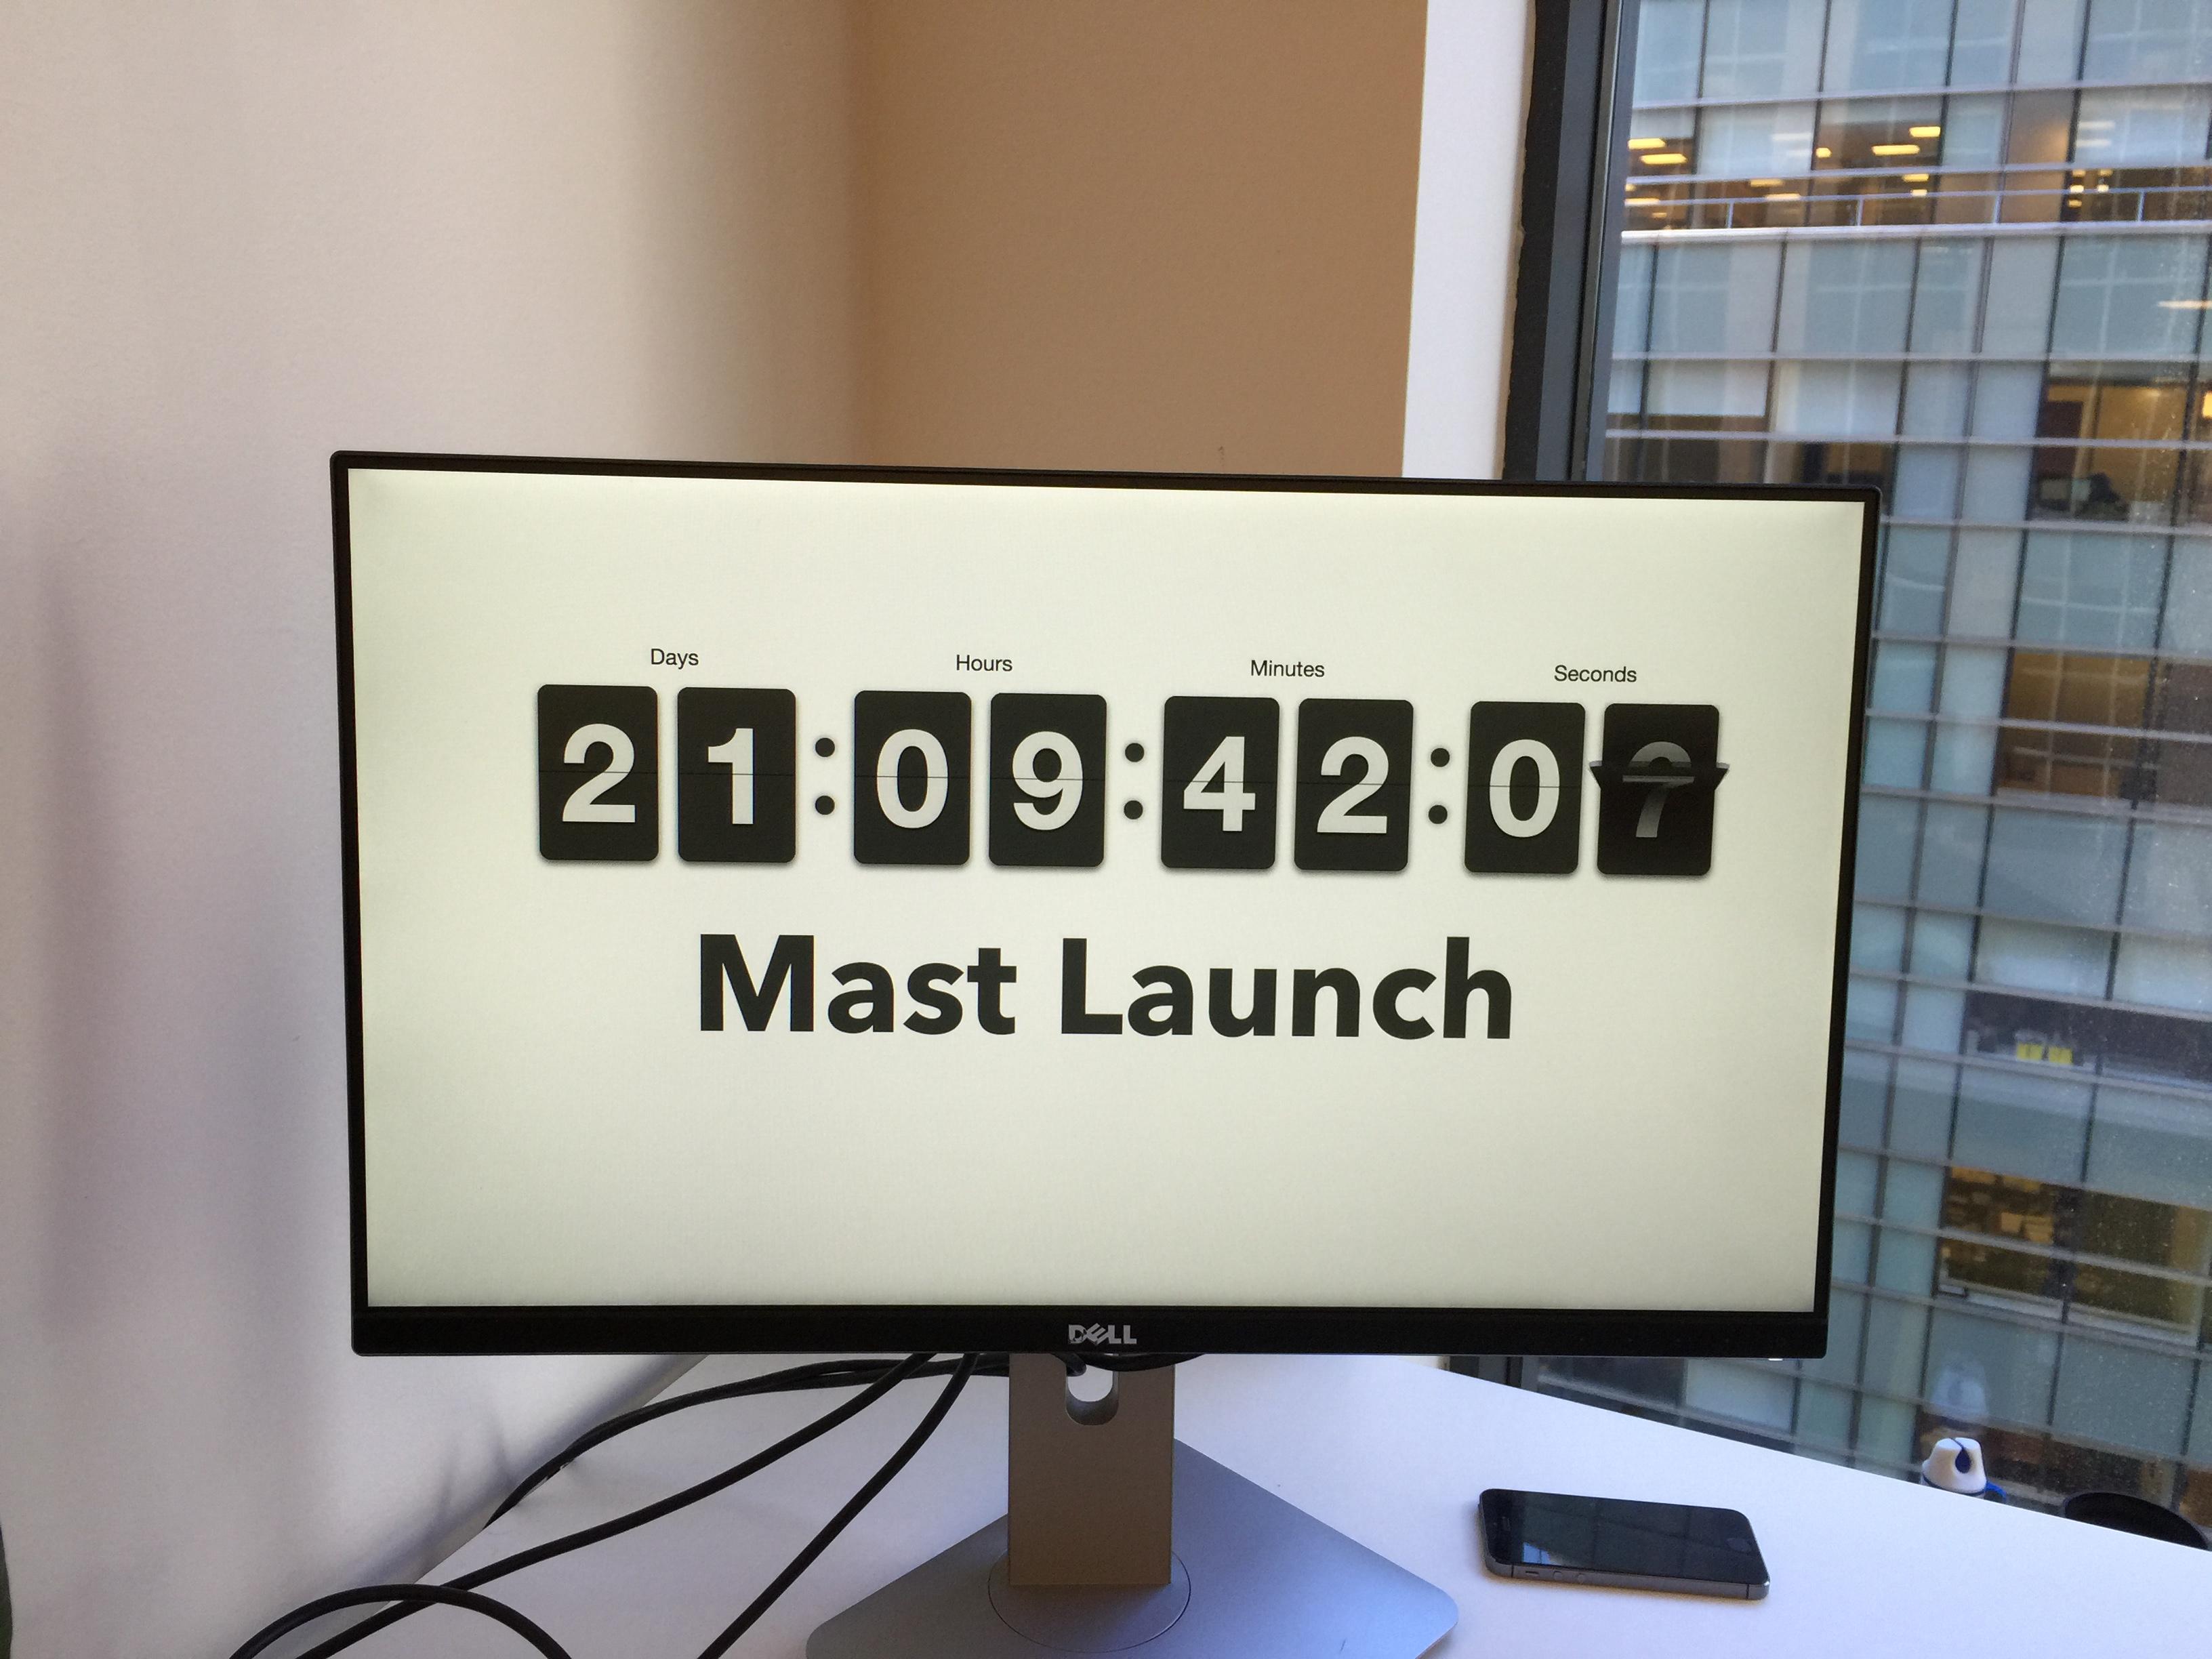 Mast Countdown, NYC